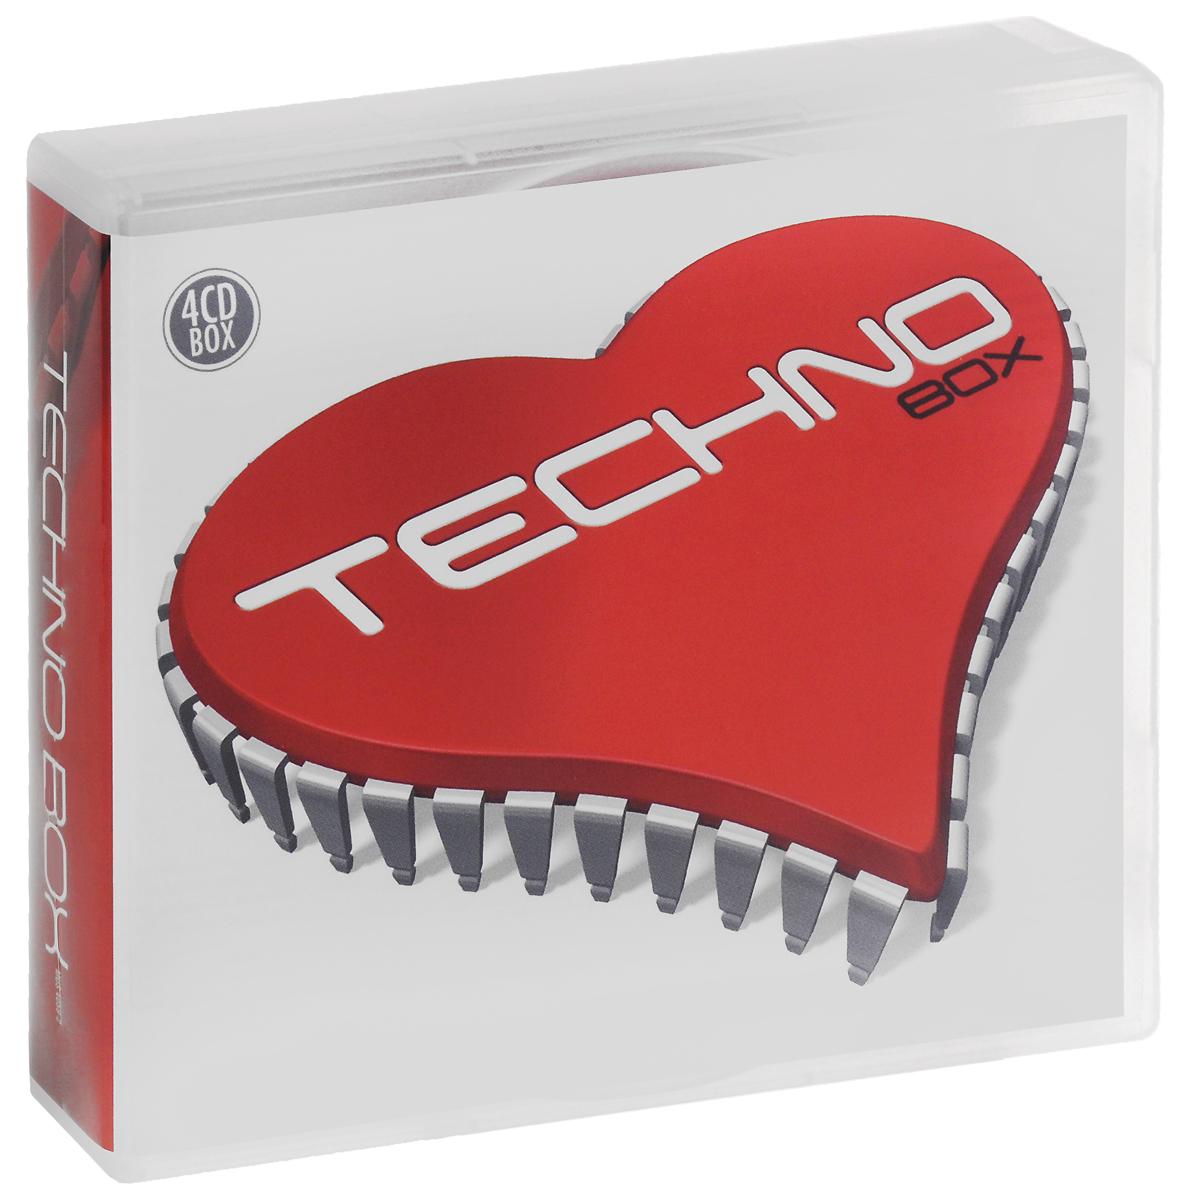 Techno Box (4 CD) 4 Audio CD